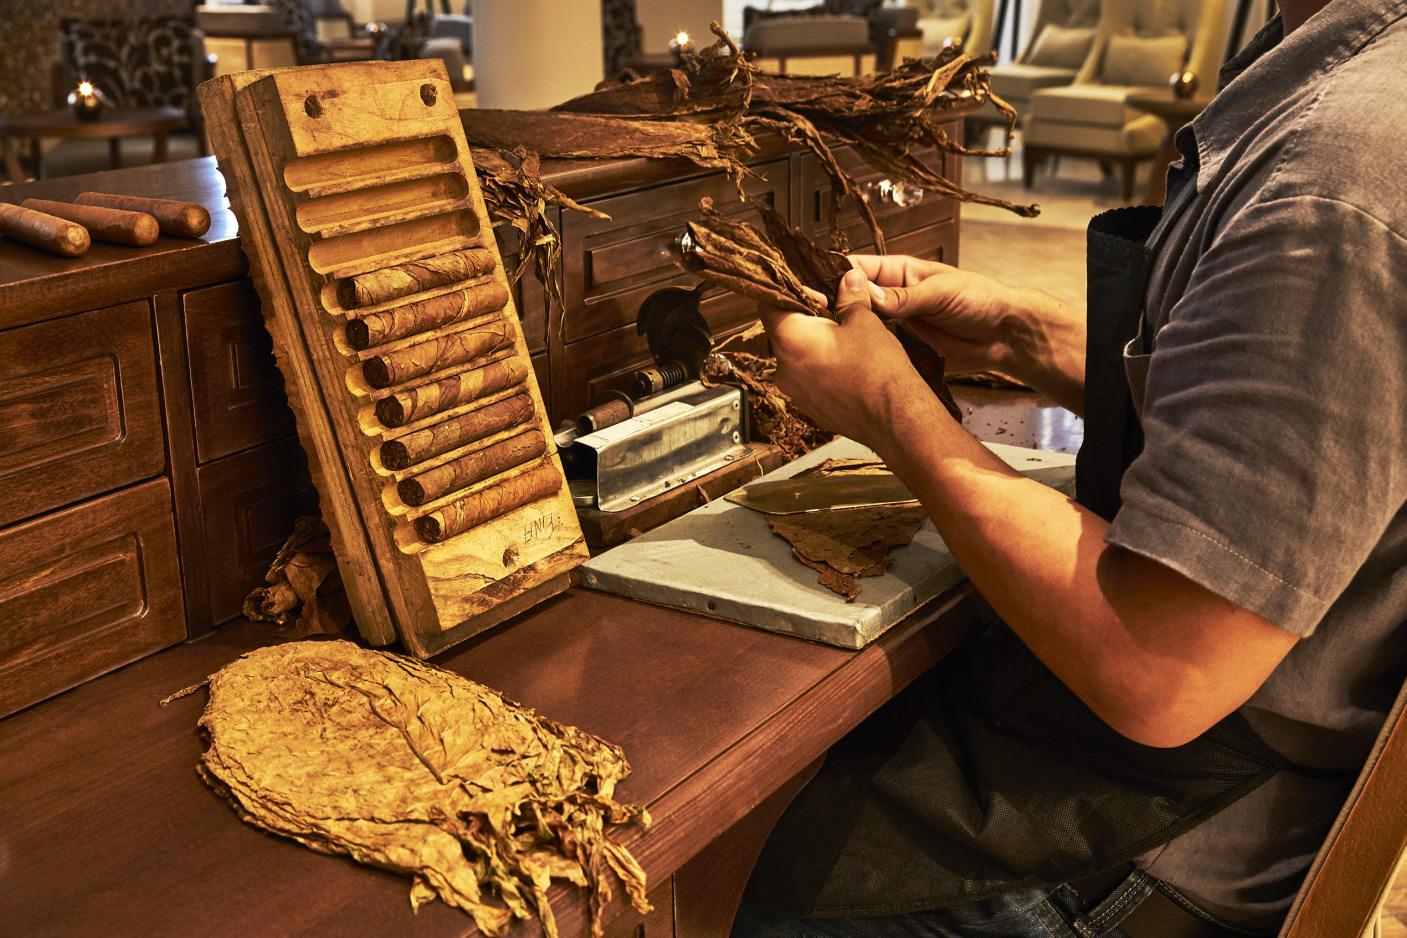 Luxushotel Gran Hotel Manzana Kempinski La Habana Bei